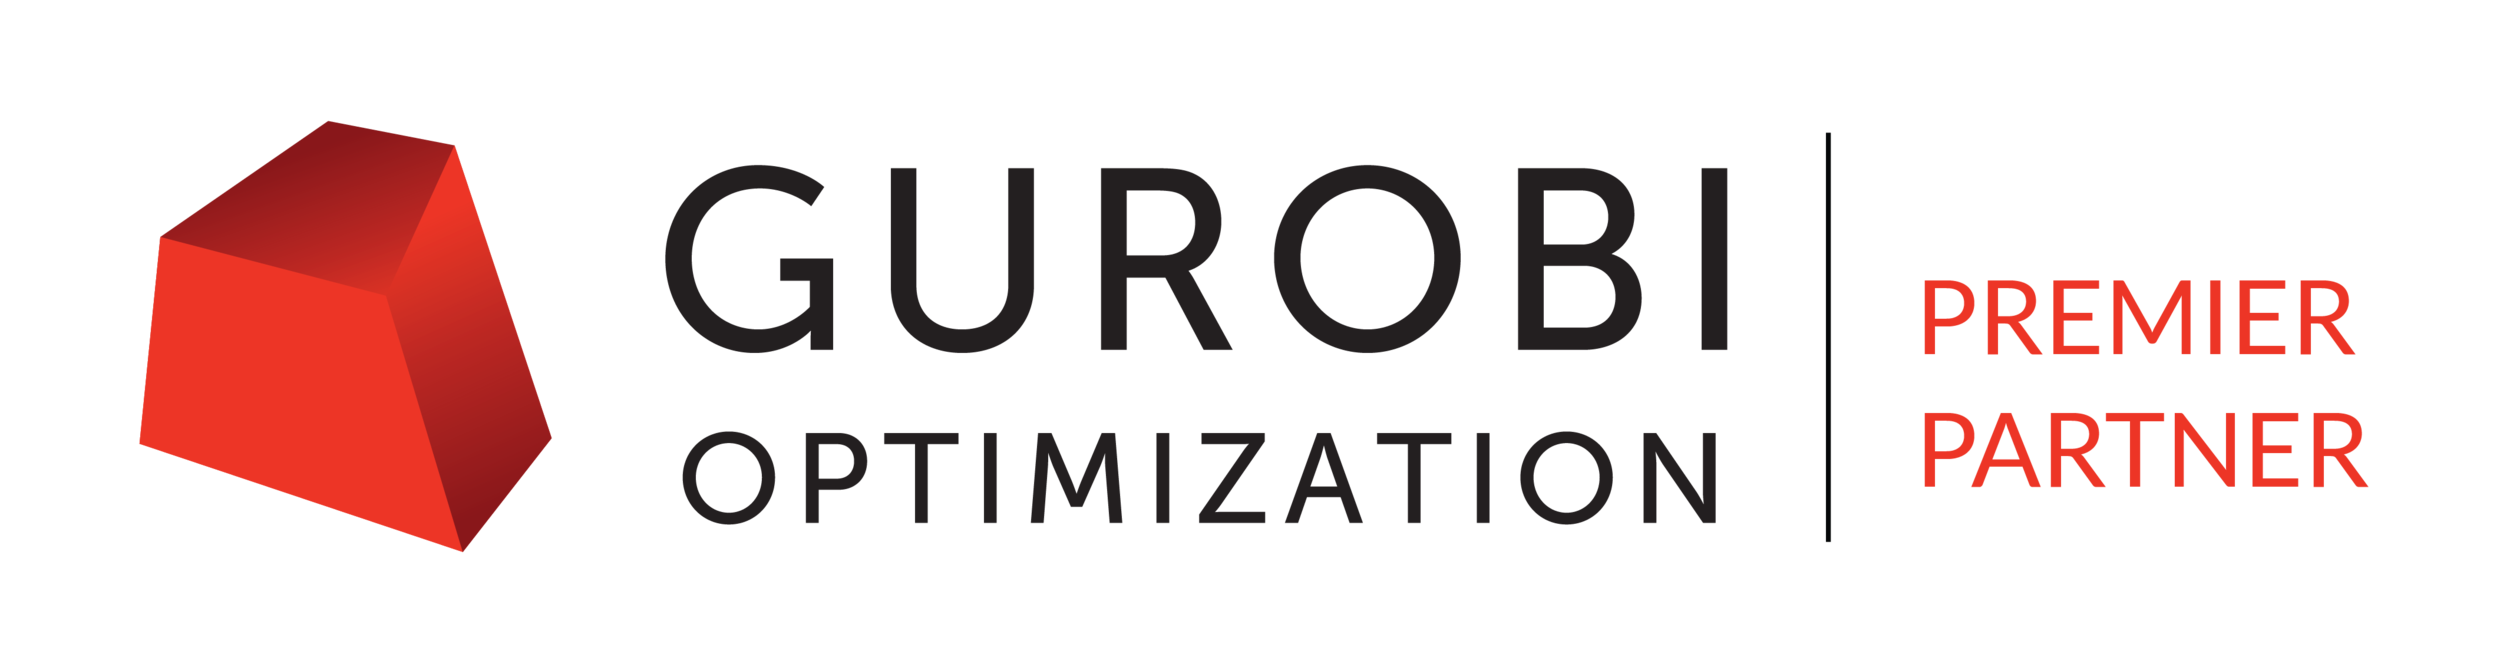 gurobi-partner-logo-2018-05-22-v1.png